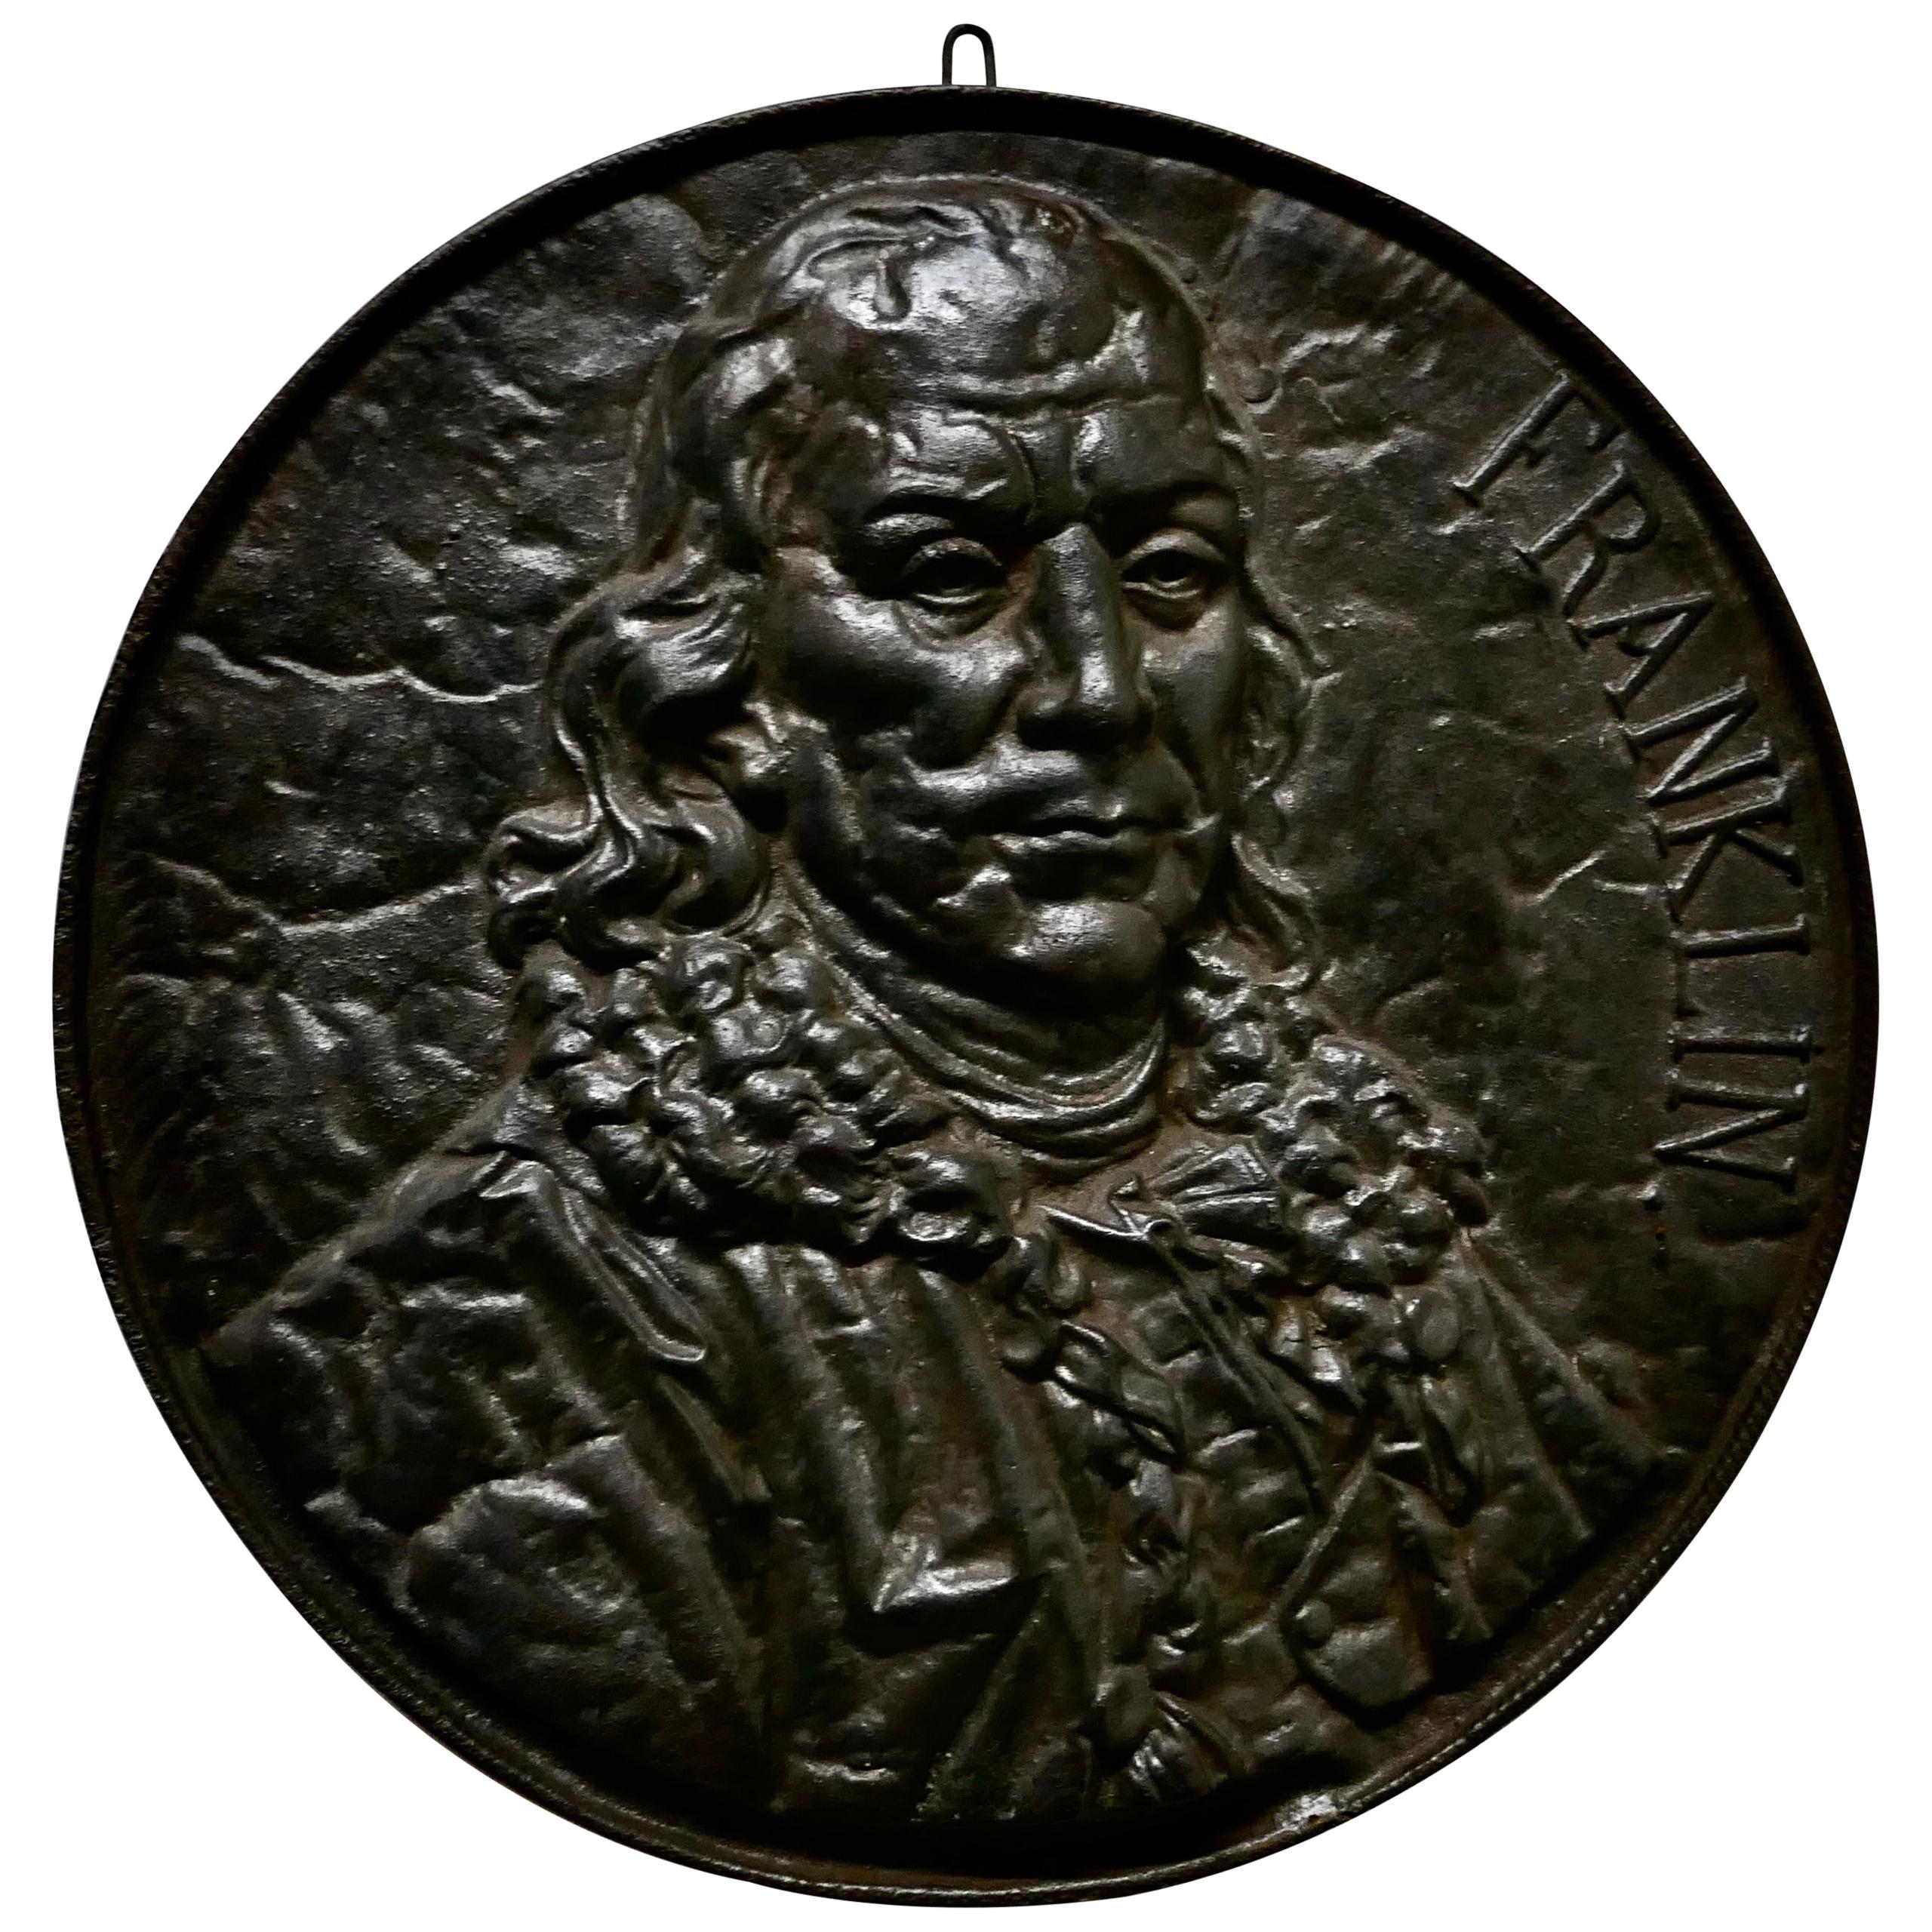 19th Century Cast Iron Bust Portrait Plaque of Benjamin Franklin